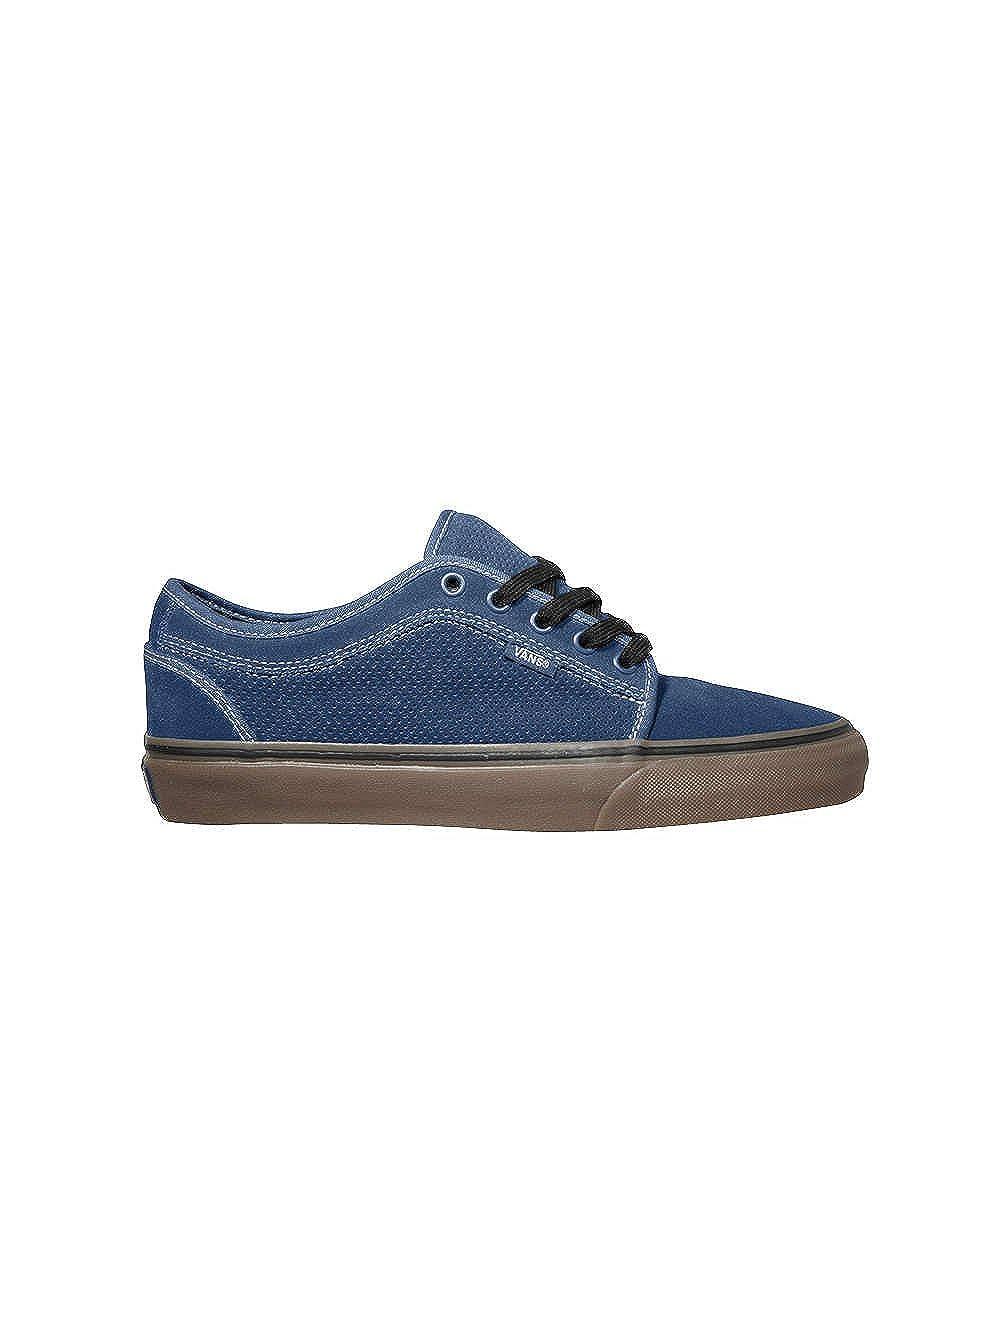 Vans Shoes Sneaker CHUKKA LOW navy blue gum, Größe:50